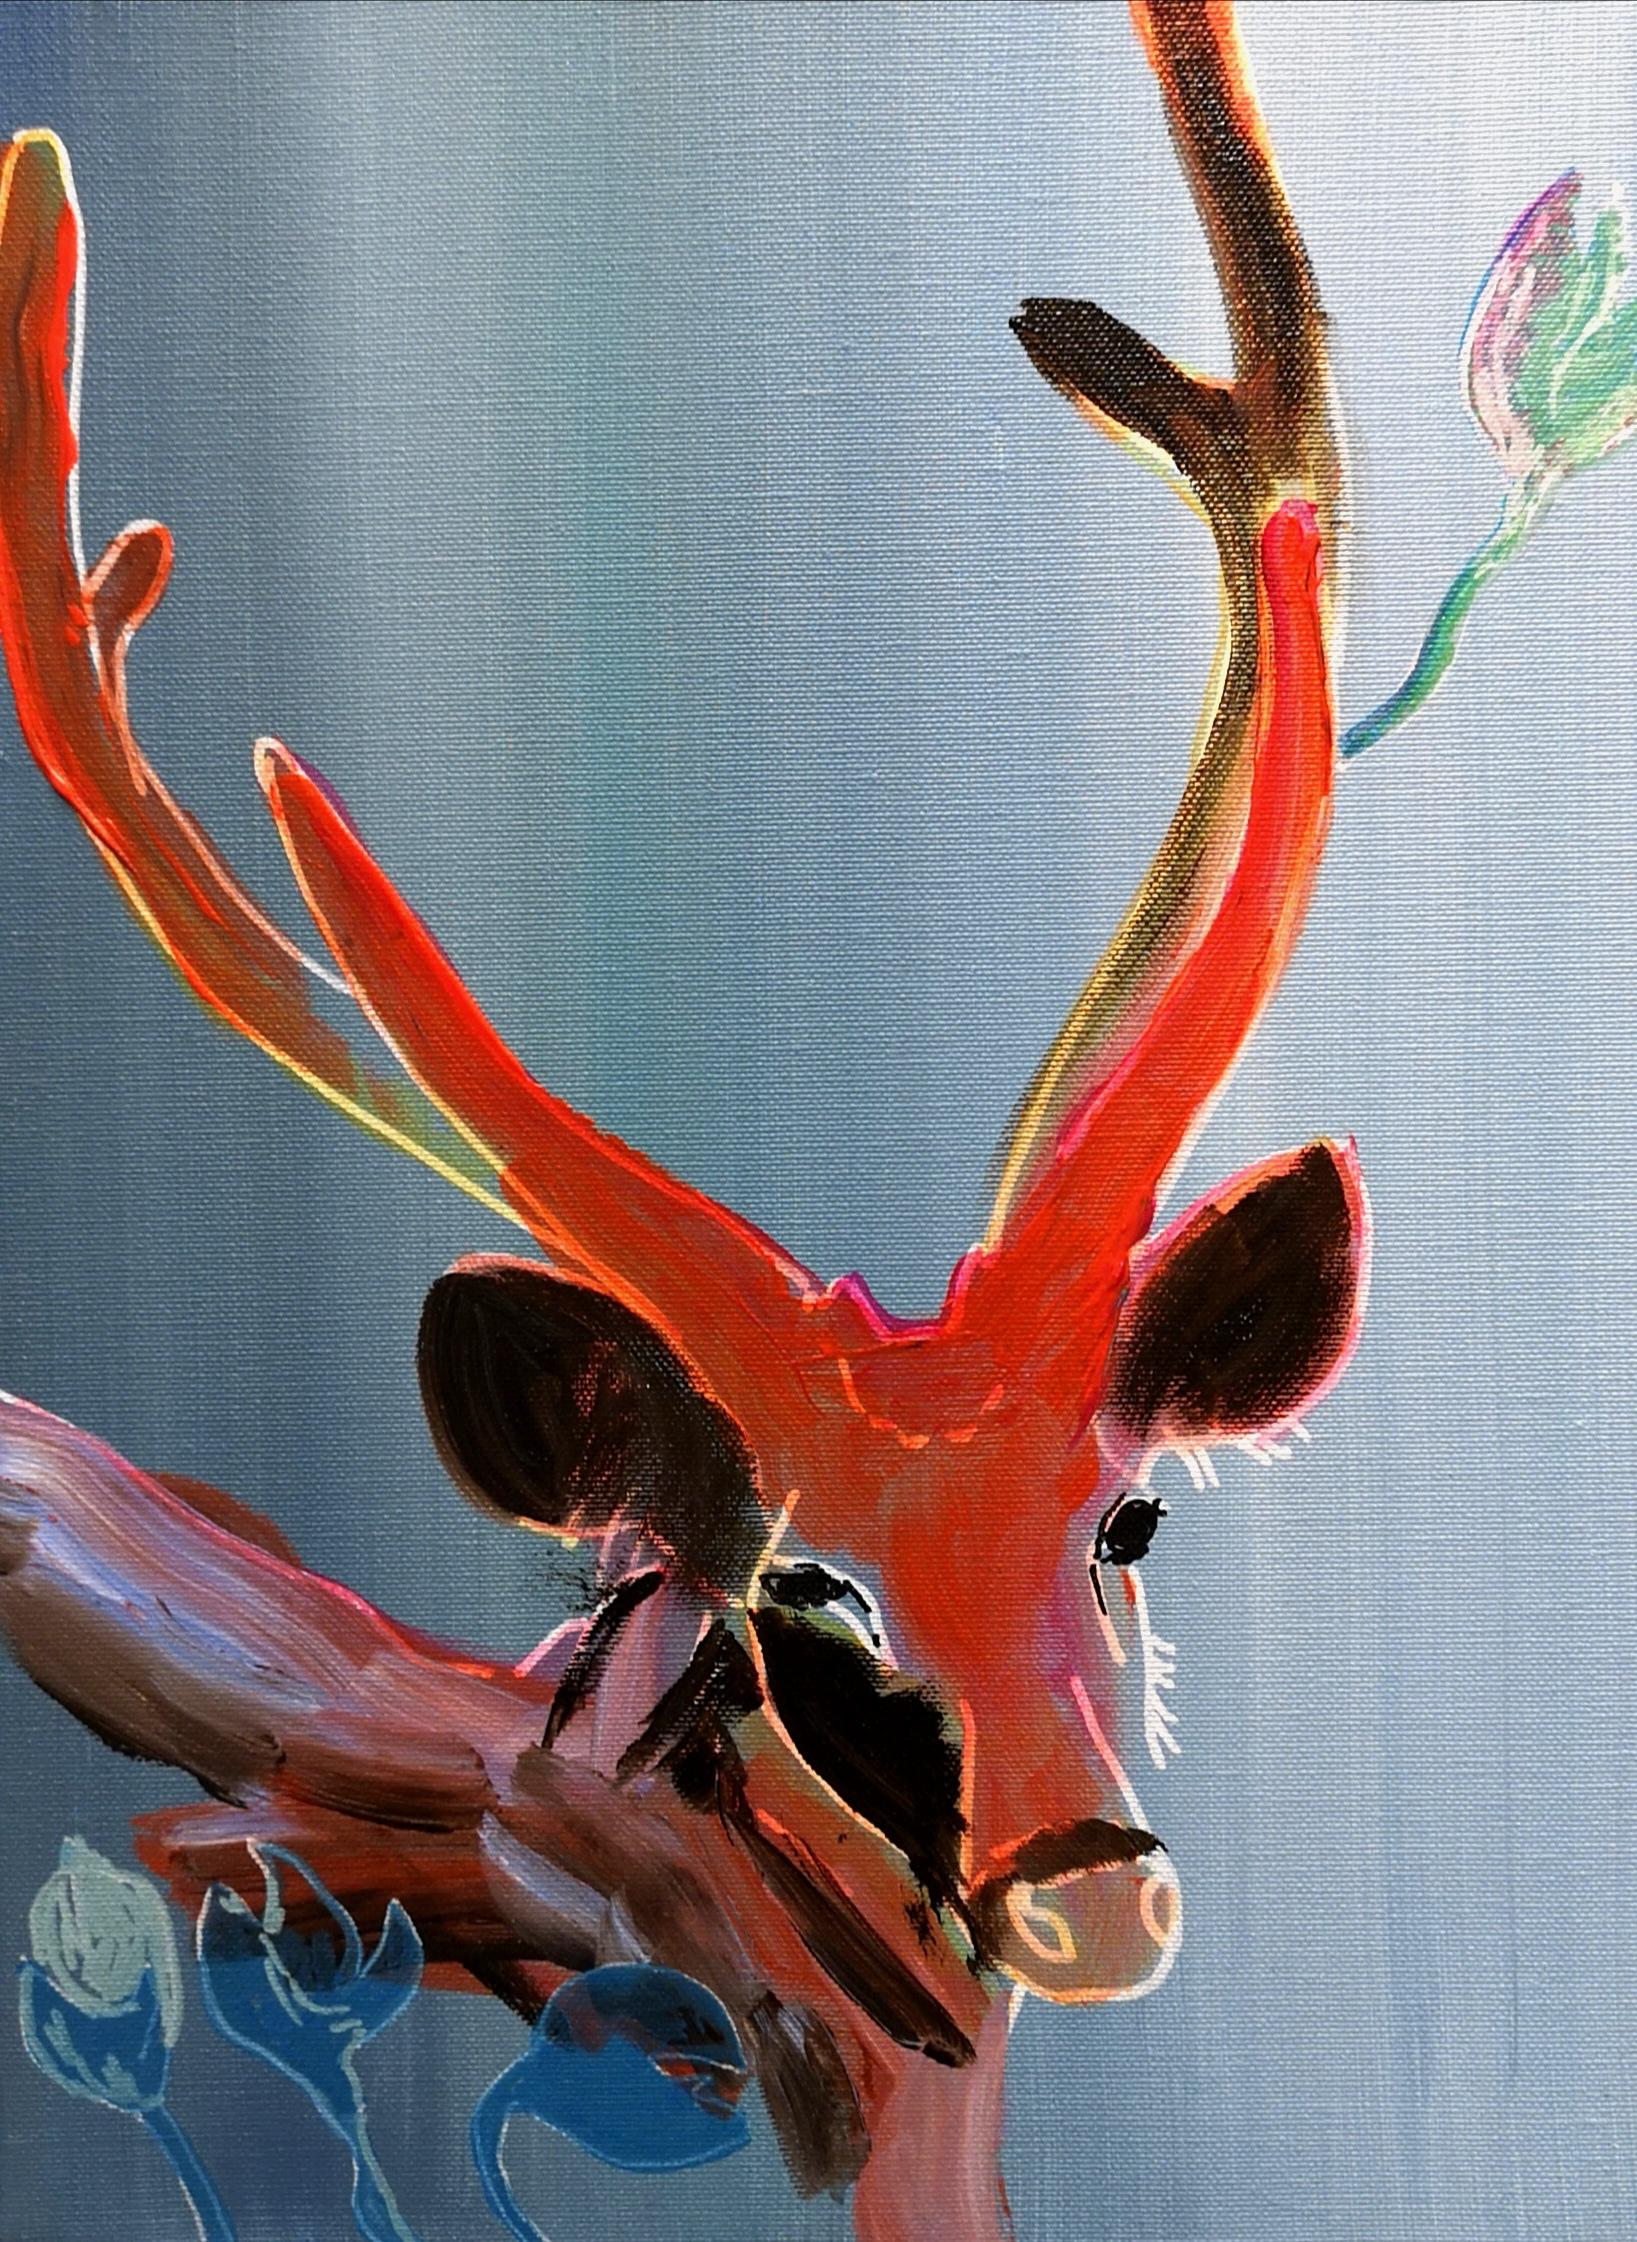 Deer & Tulips - Modern Figurative Animal Painting, Joyful, Colourful